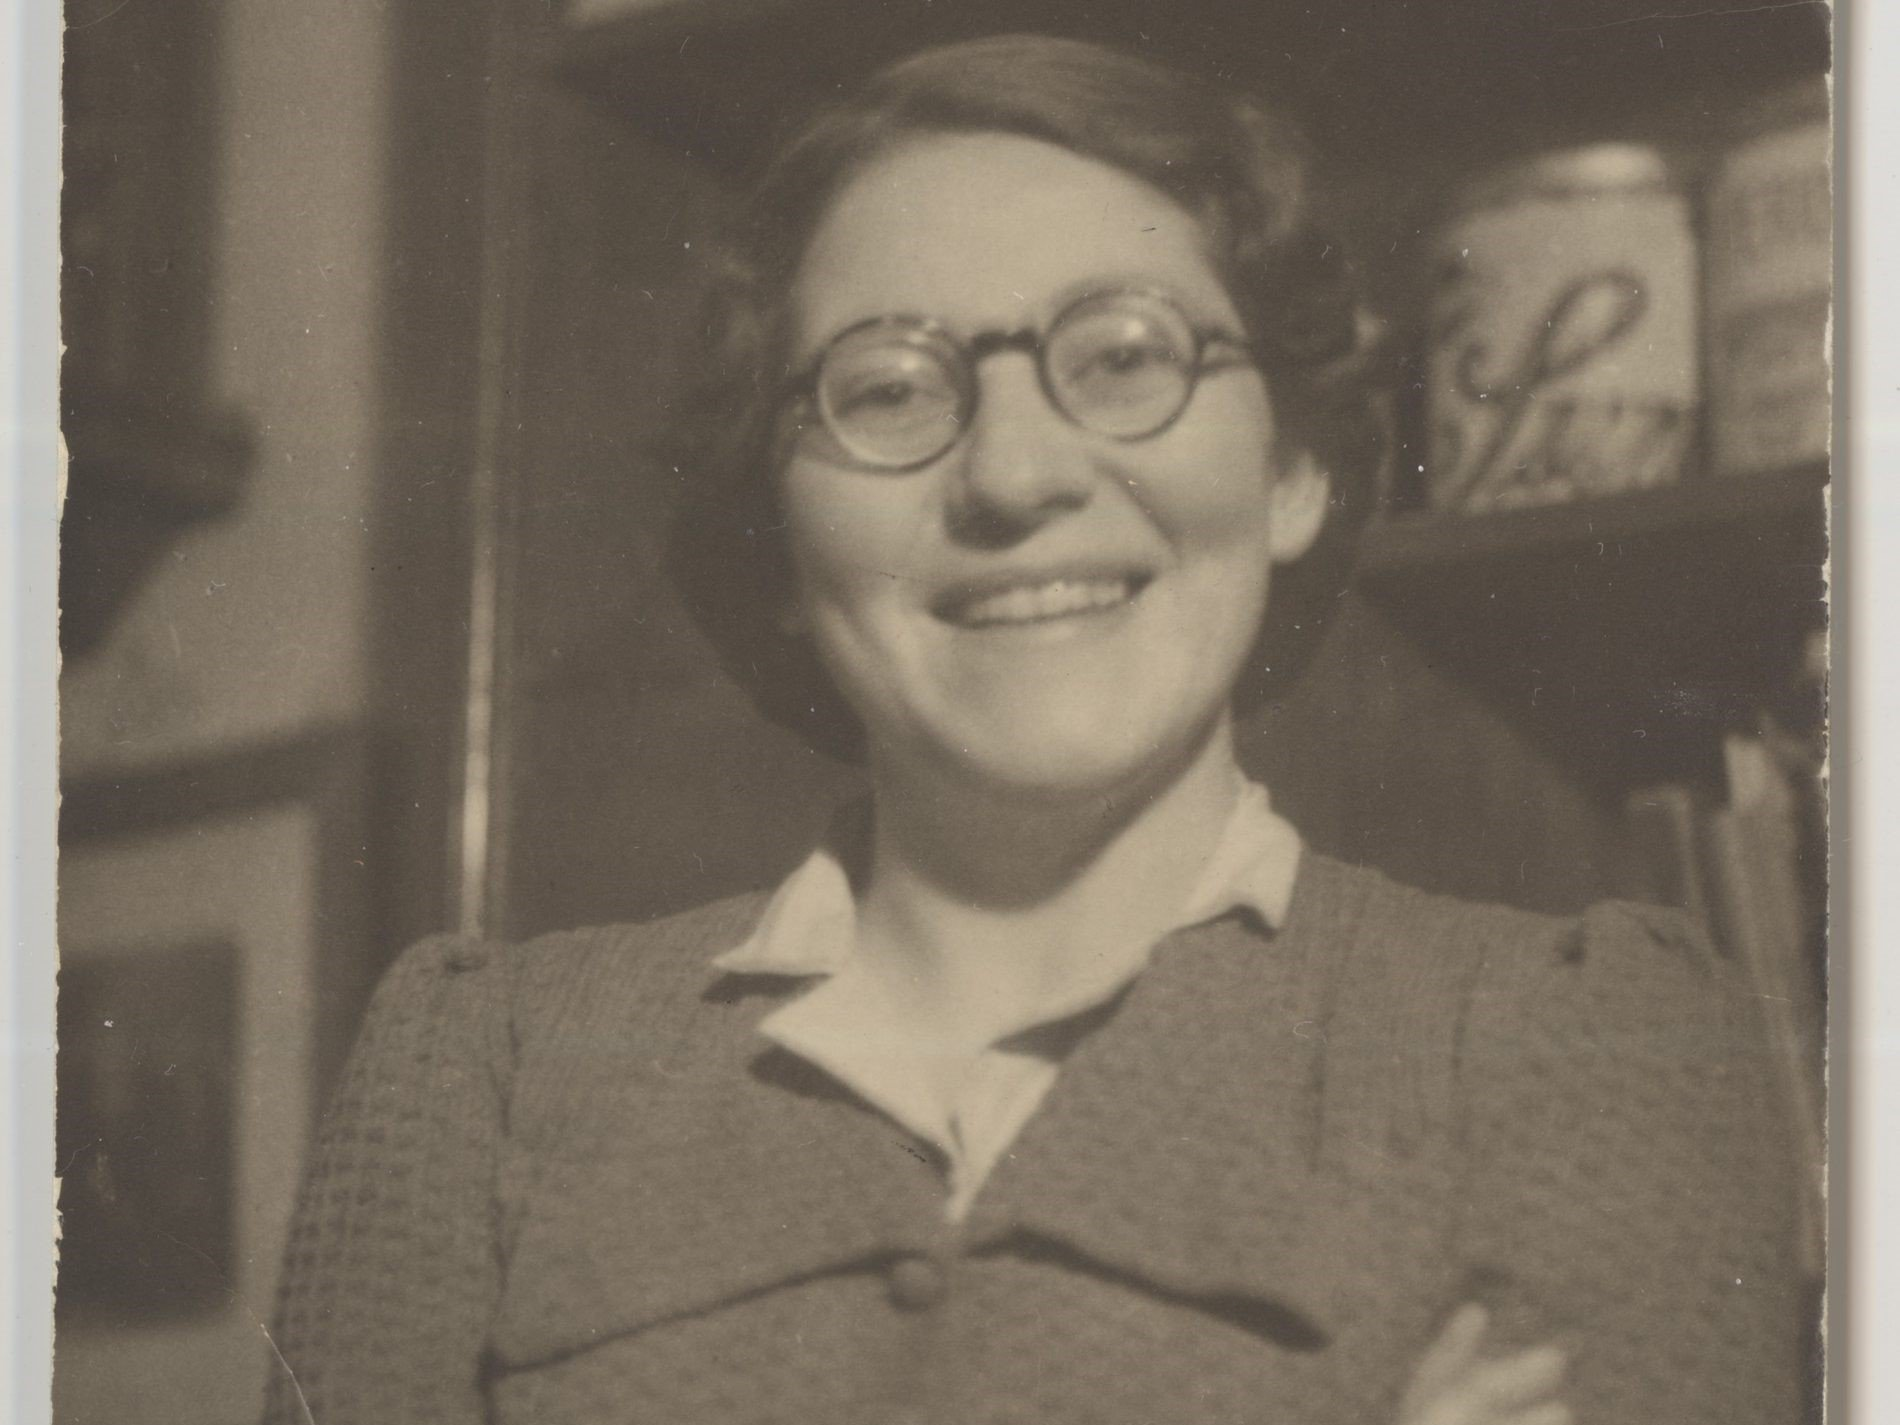 Martha Blun